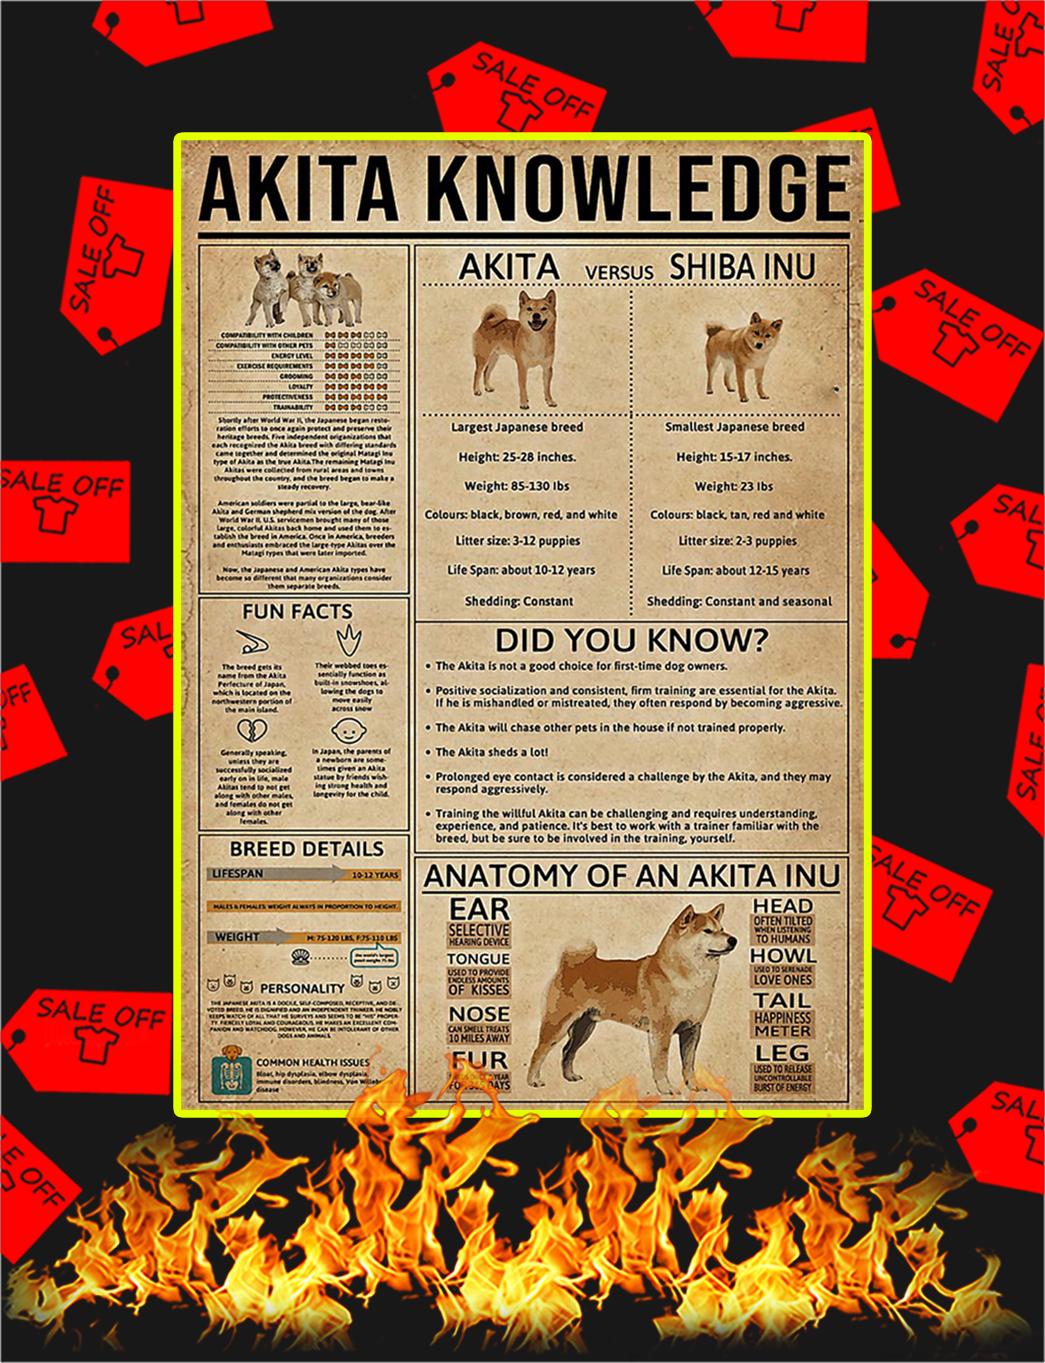 Akita Knowledge Poster - A2